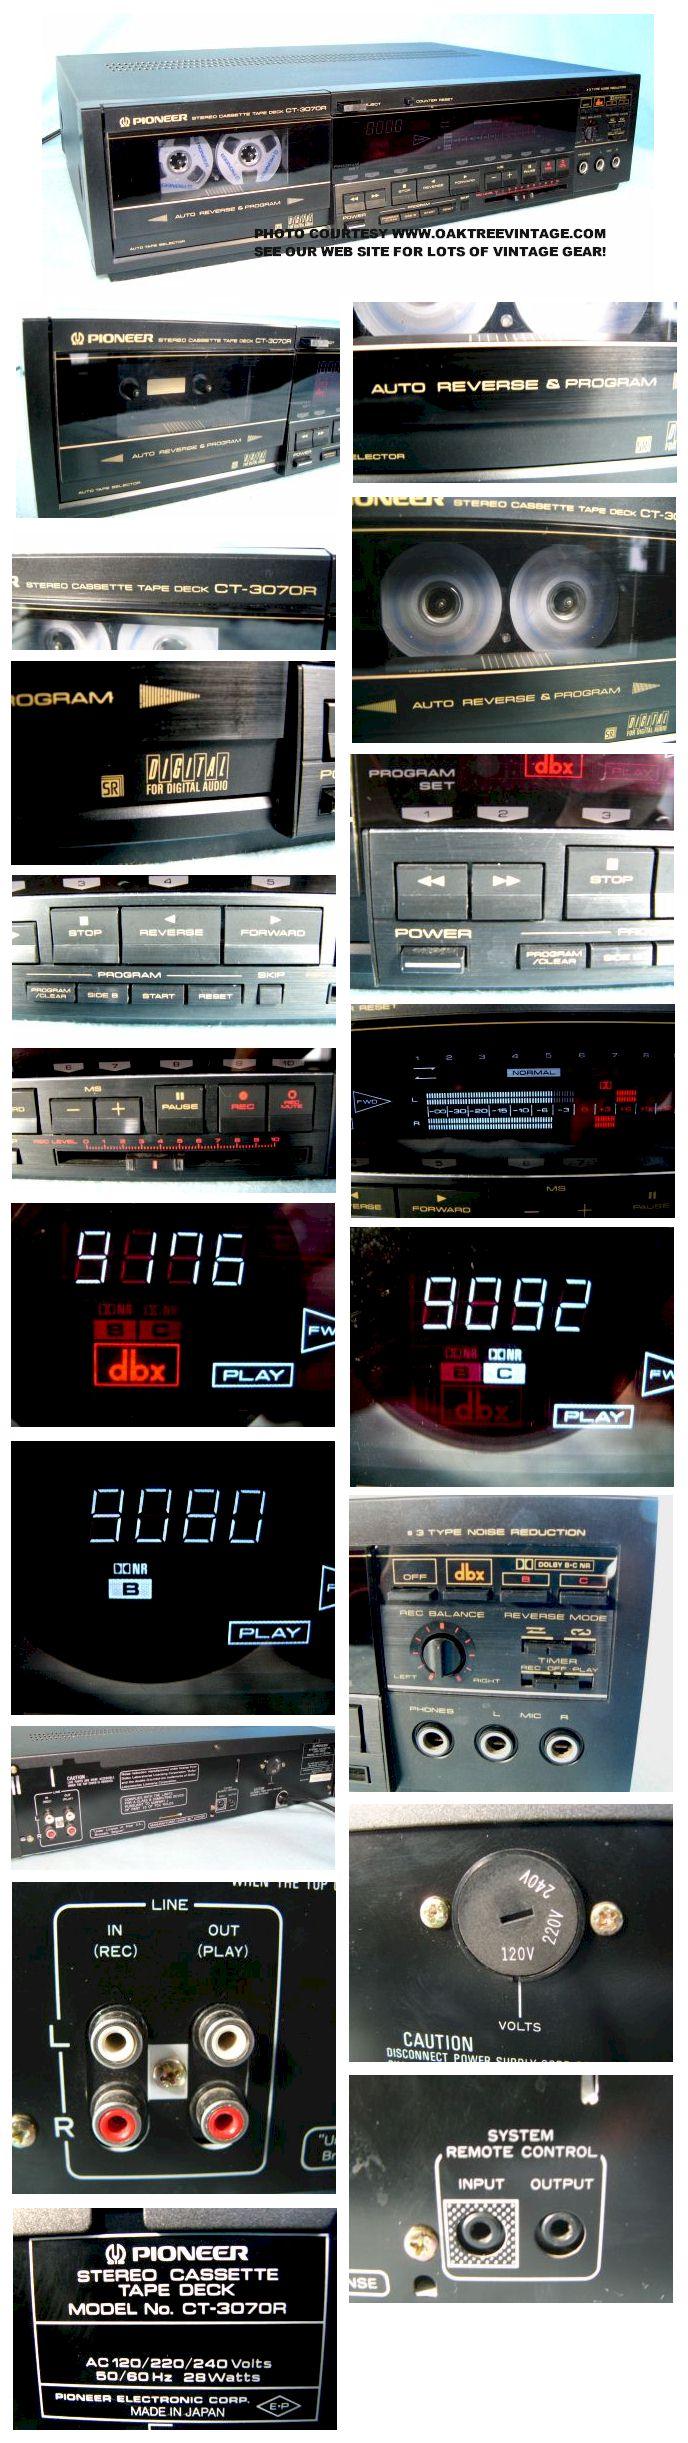 apresentação Ducar - Página 5 Pioneer_CT-3070R_Stereo_Cassette_Deck_collage